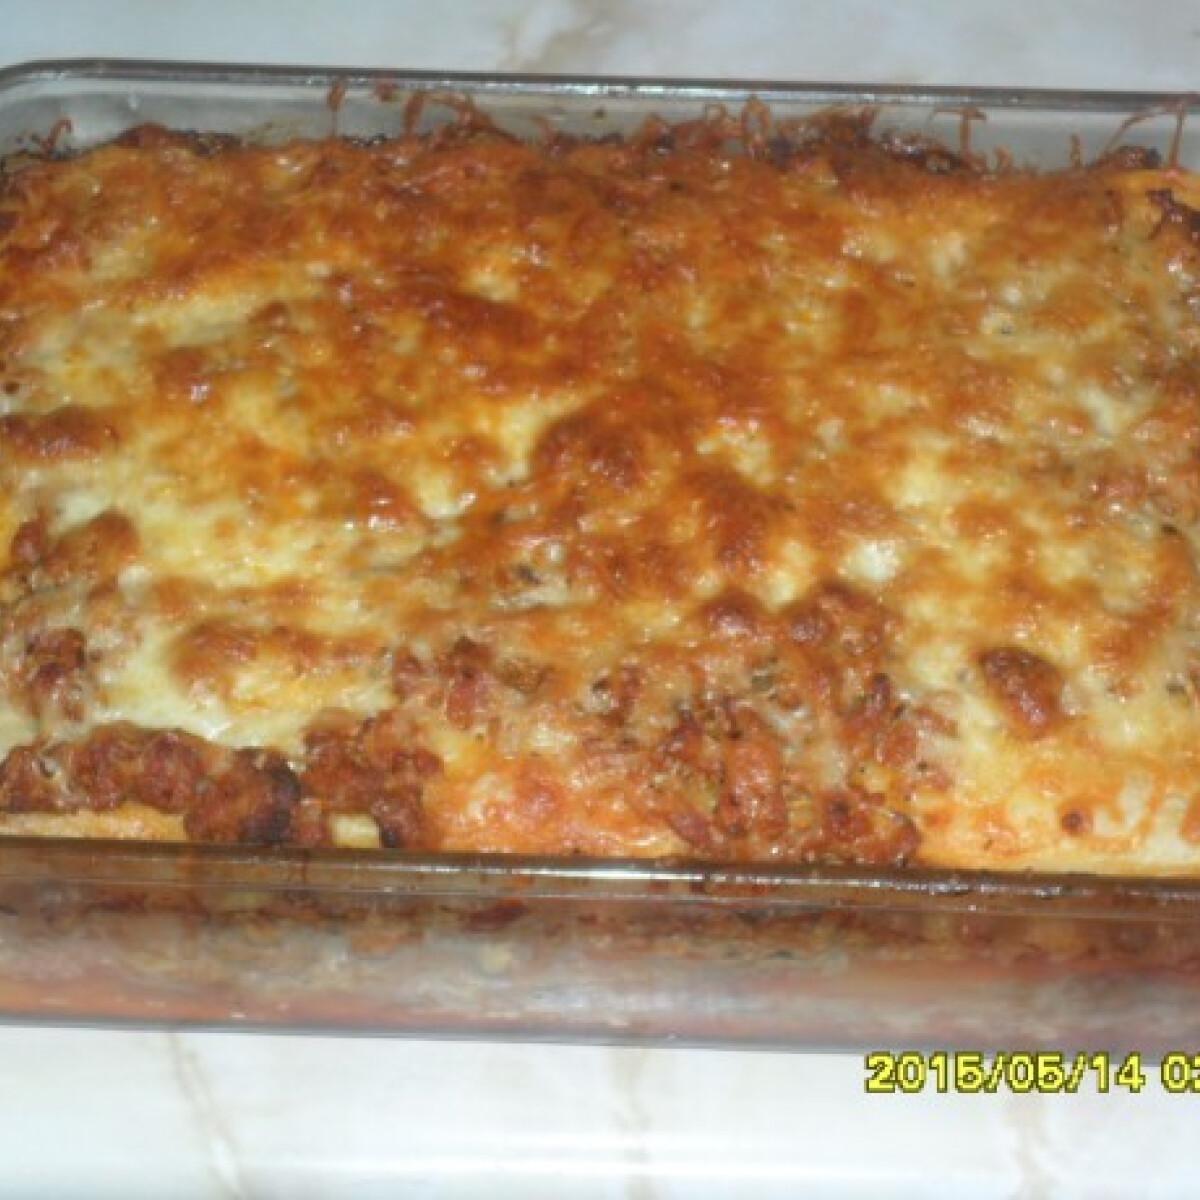 Hamis lasagne